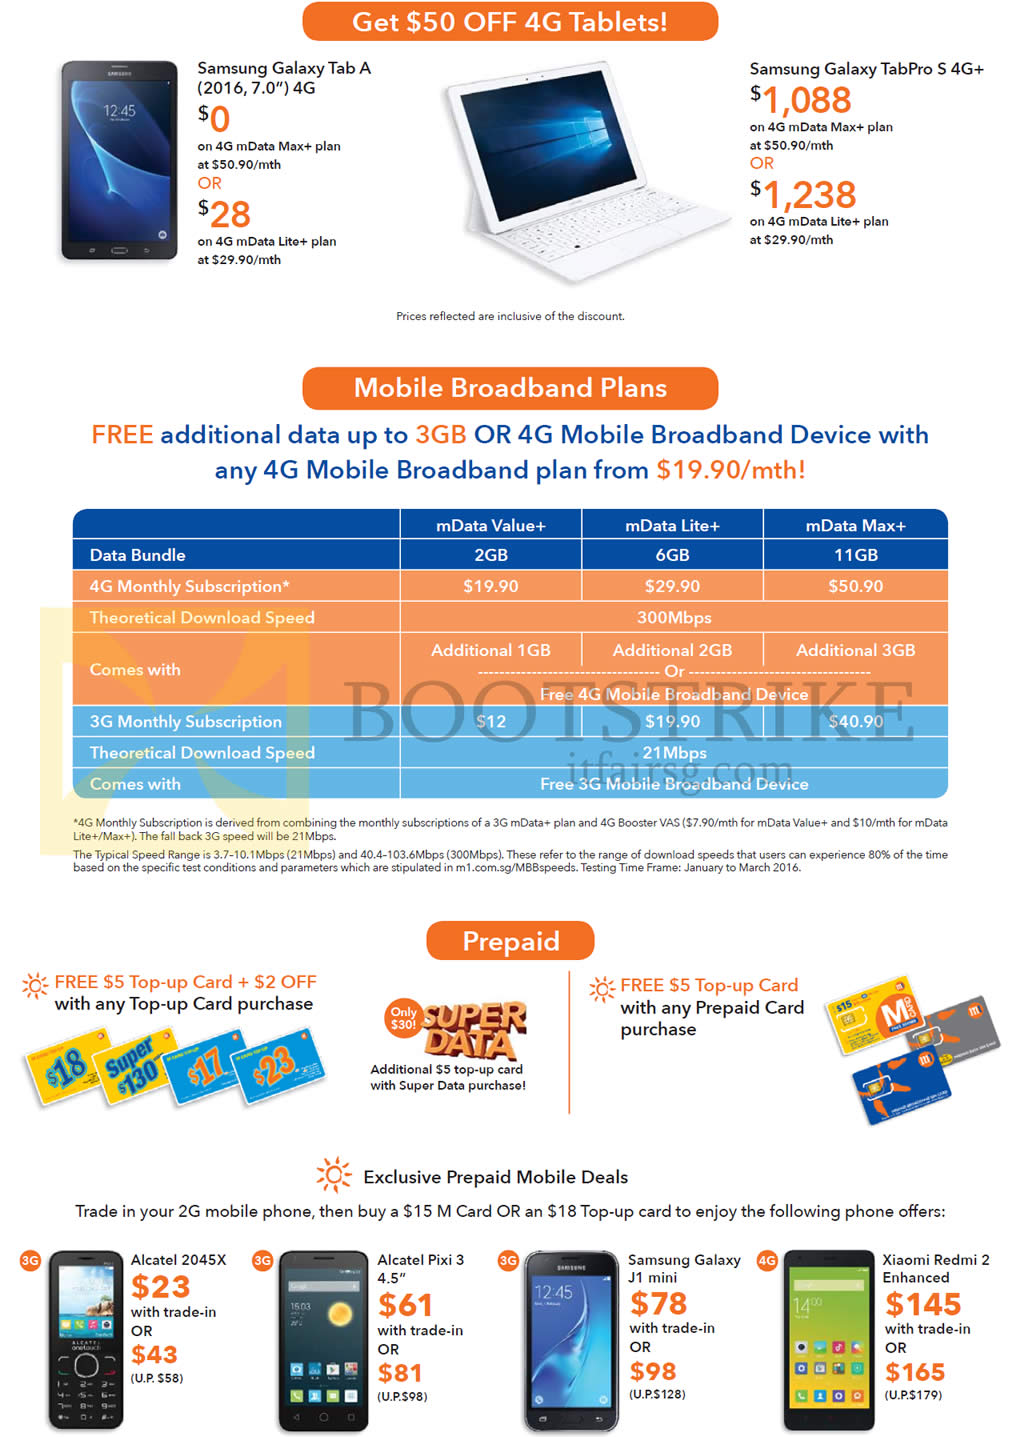 Tablets Mobile Broadband Plans Prepaid Samsung Galaxy